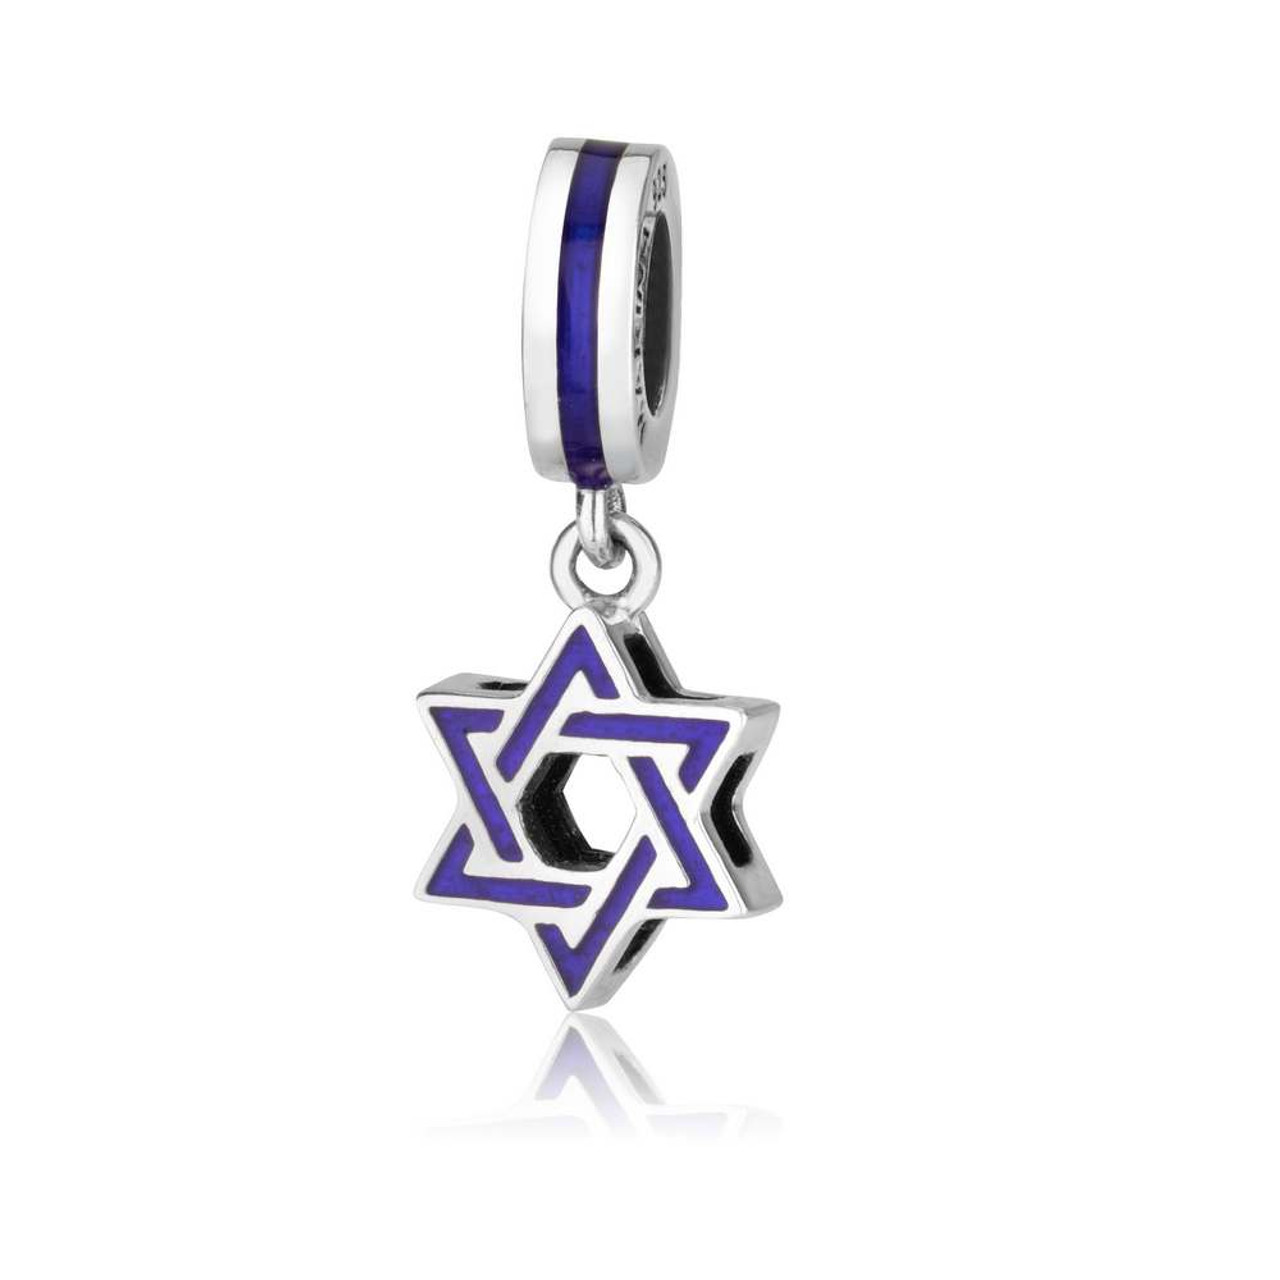 Silver star of david pendant charm yourholylandstore star of david pendant charm aloadofball Choice Image